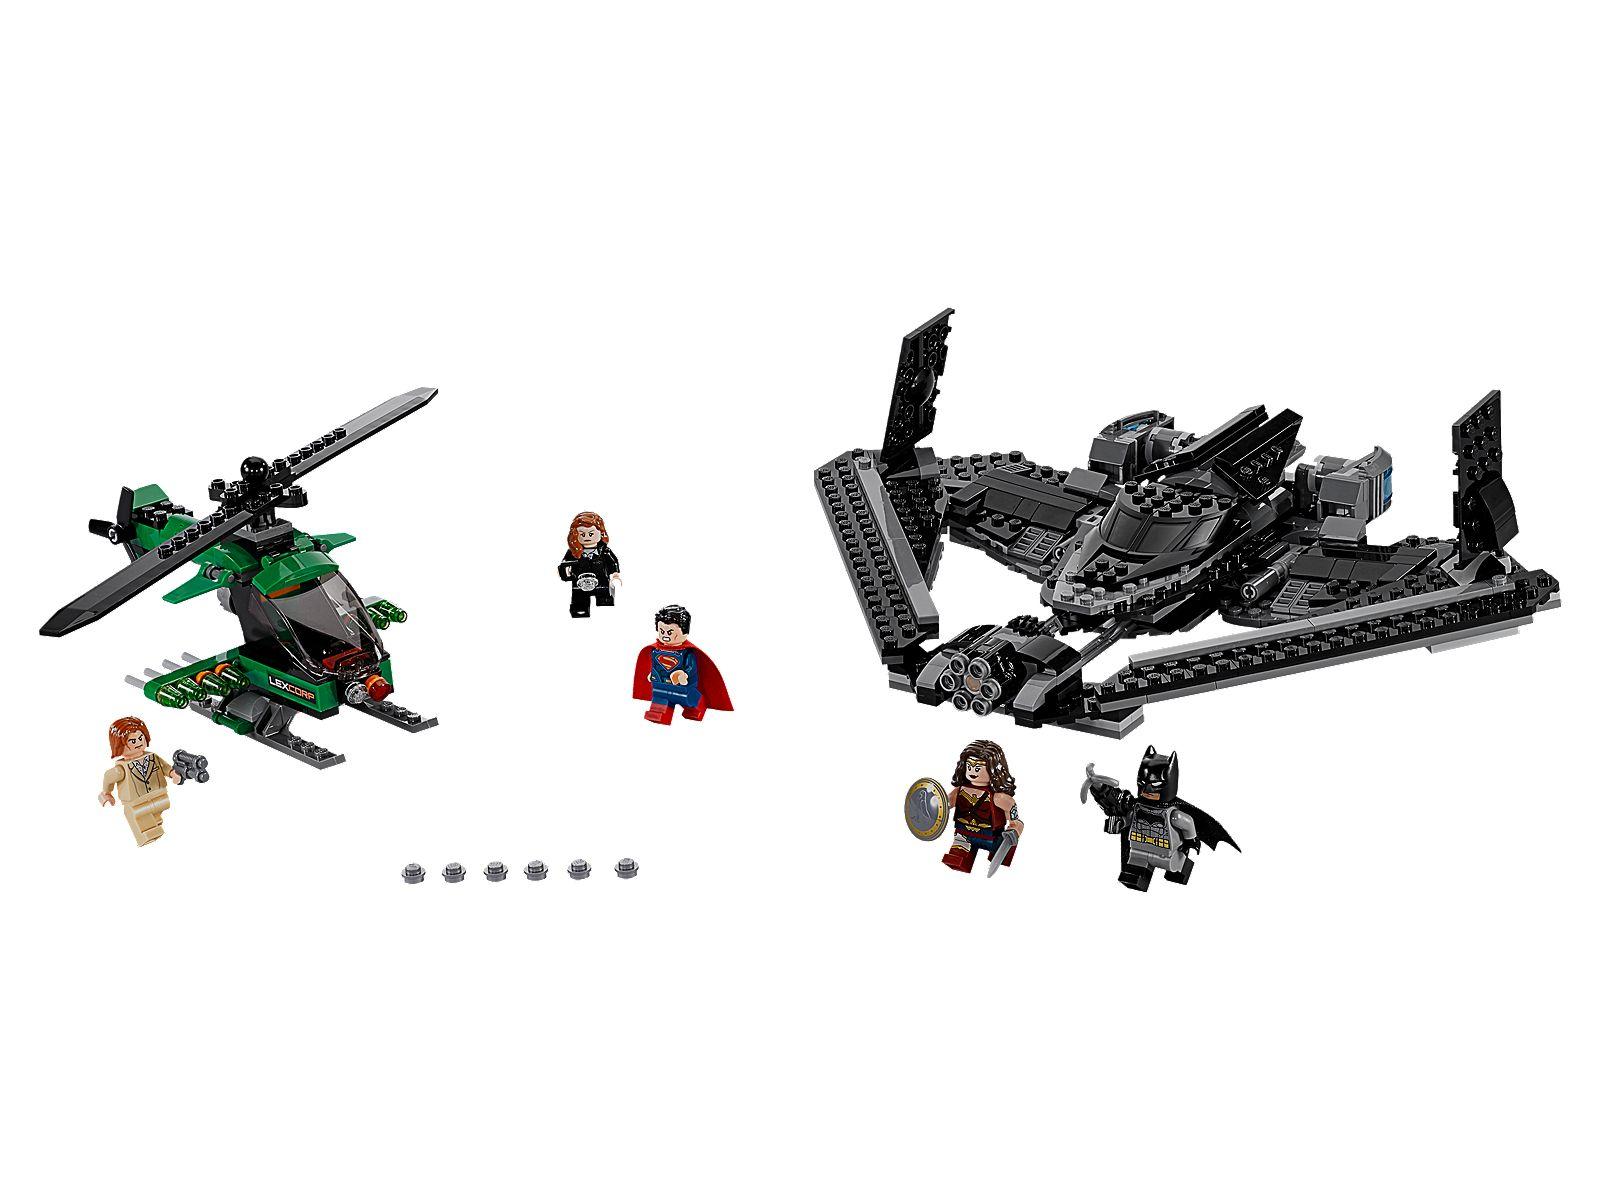 Lego Web Site Posted Official Images of Batman V Superman